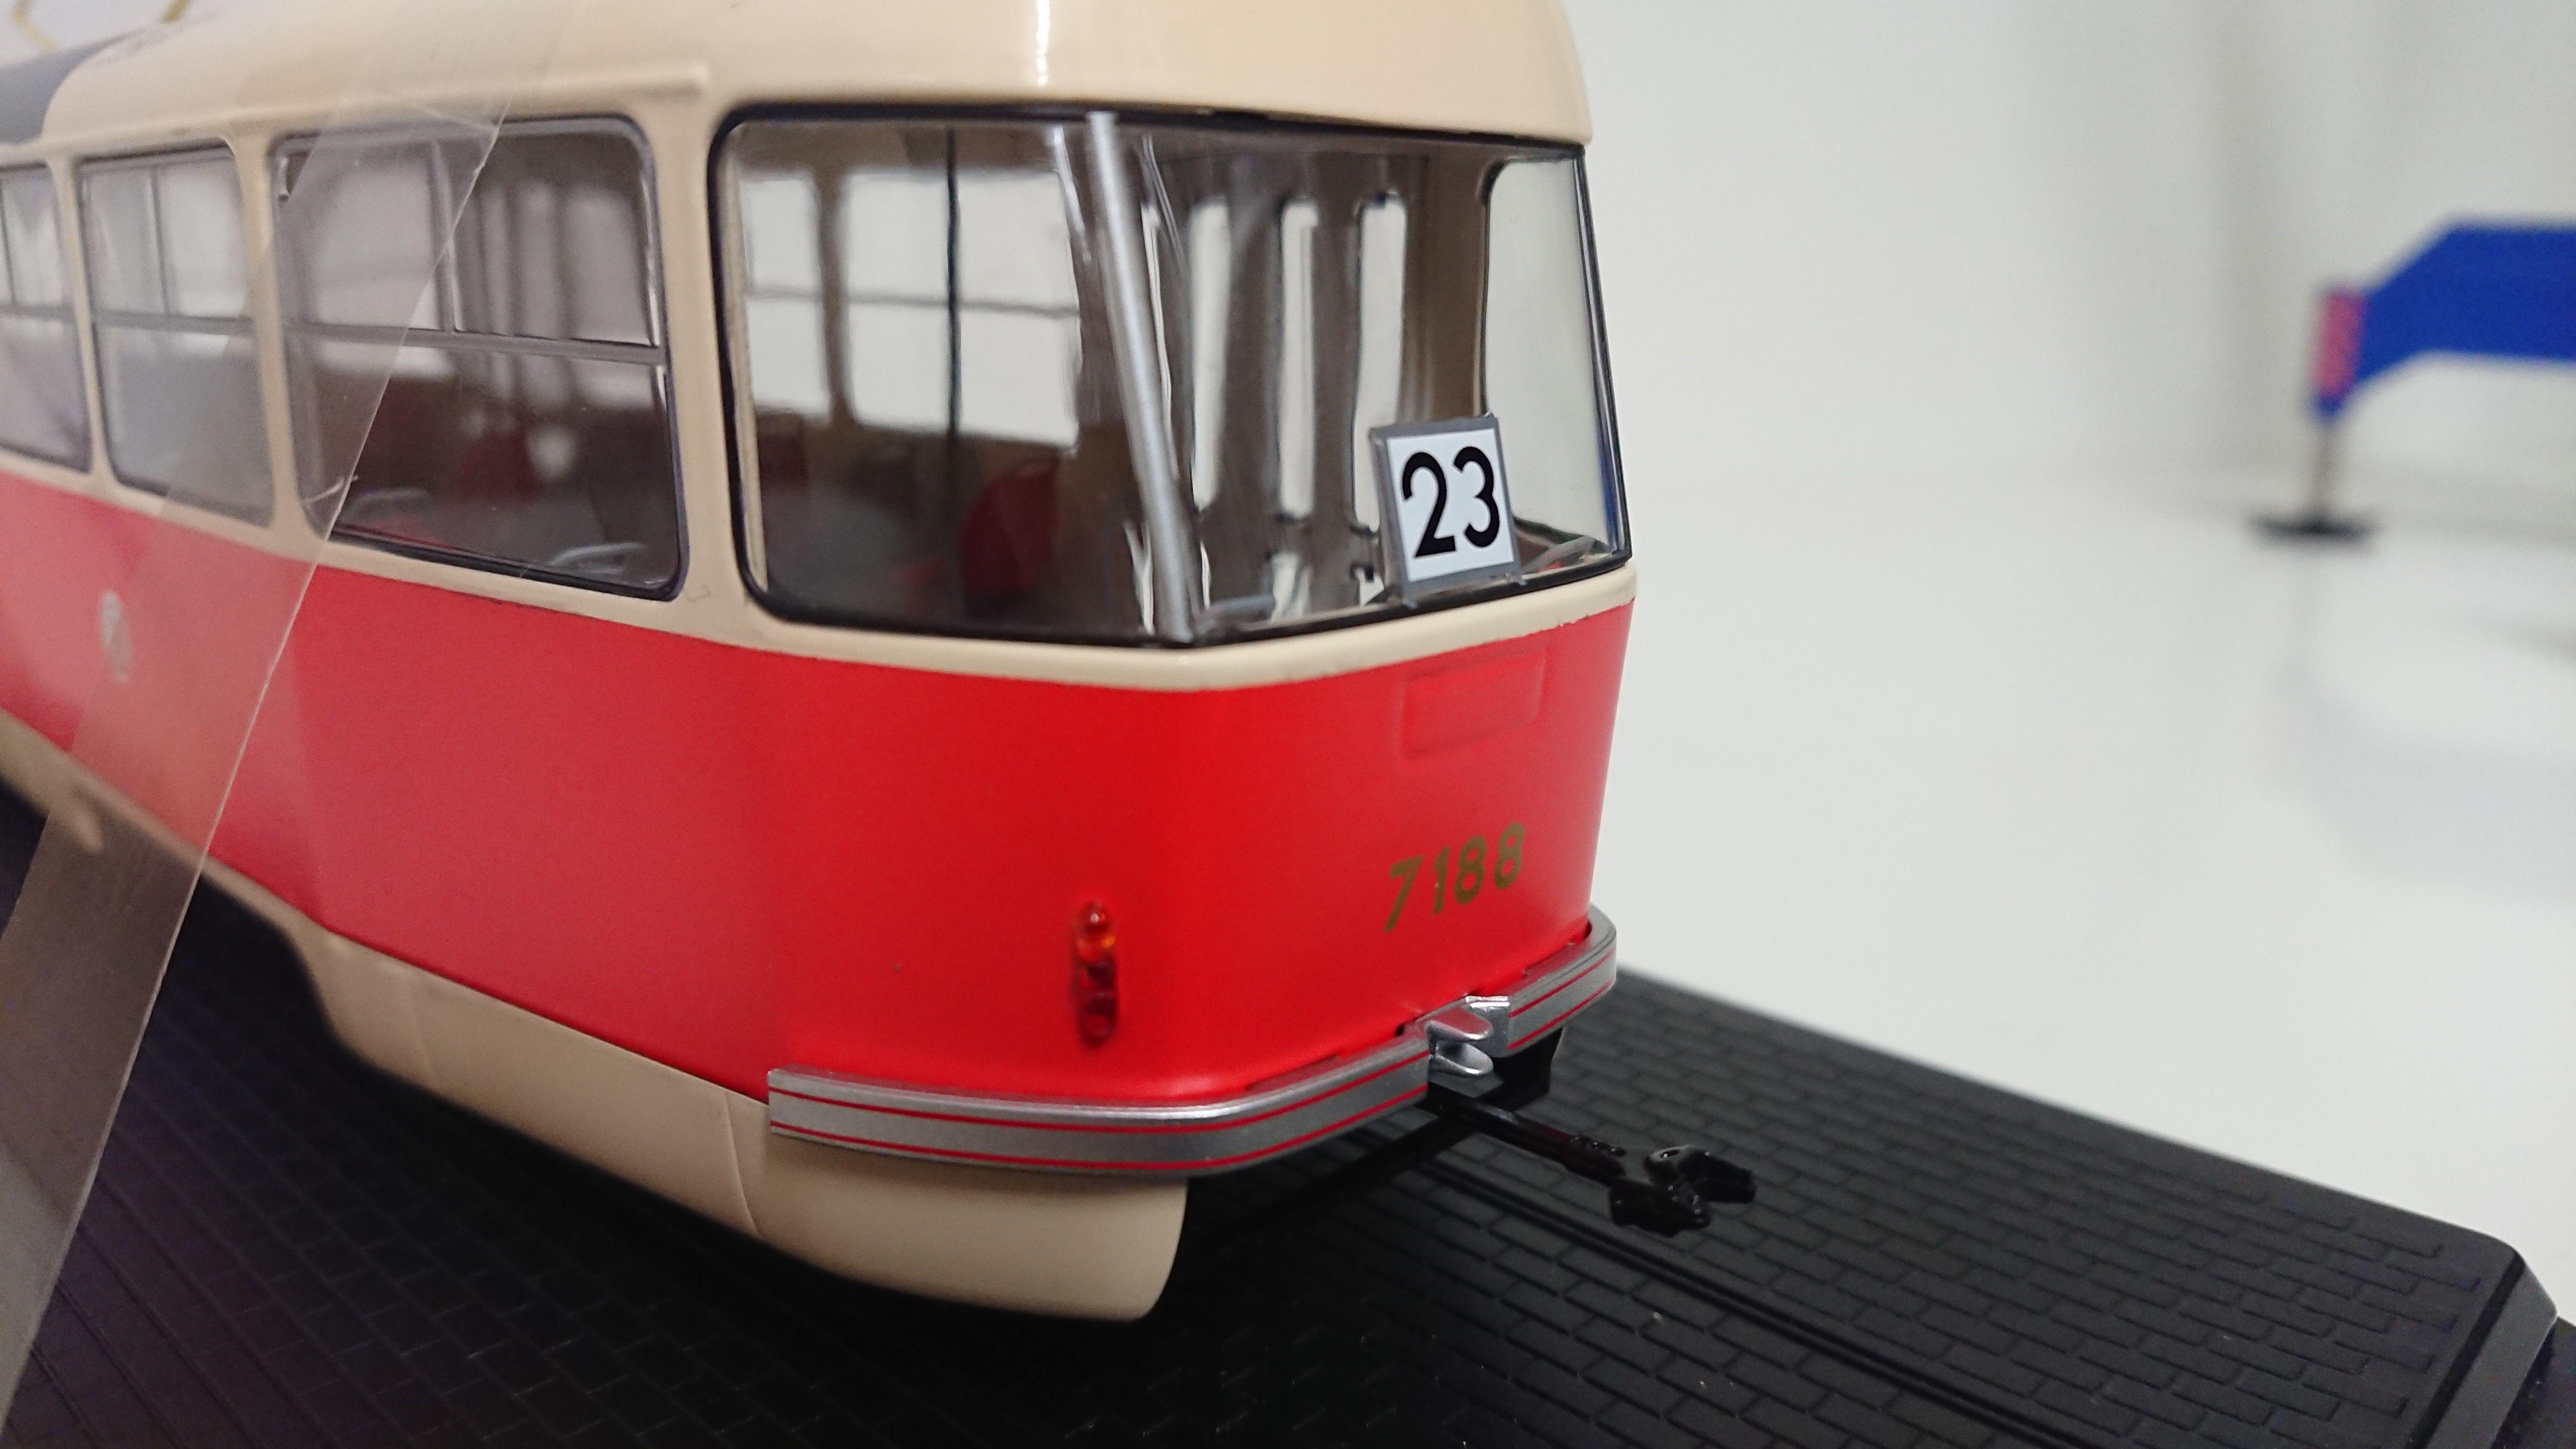 Macheta tramvai Tatra T3, scara 1:43 2